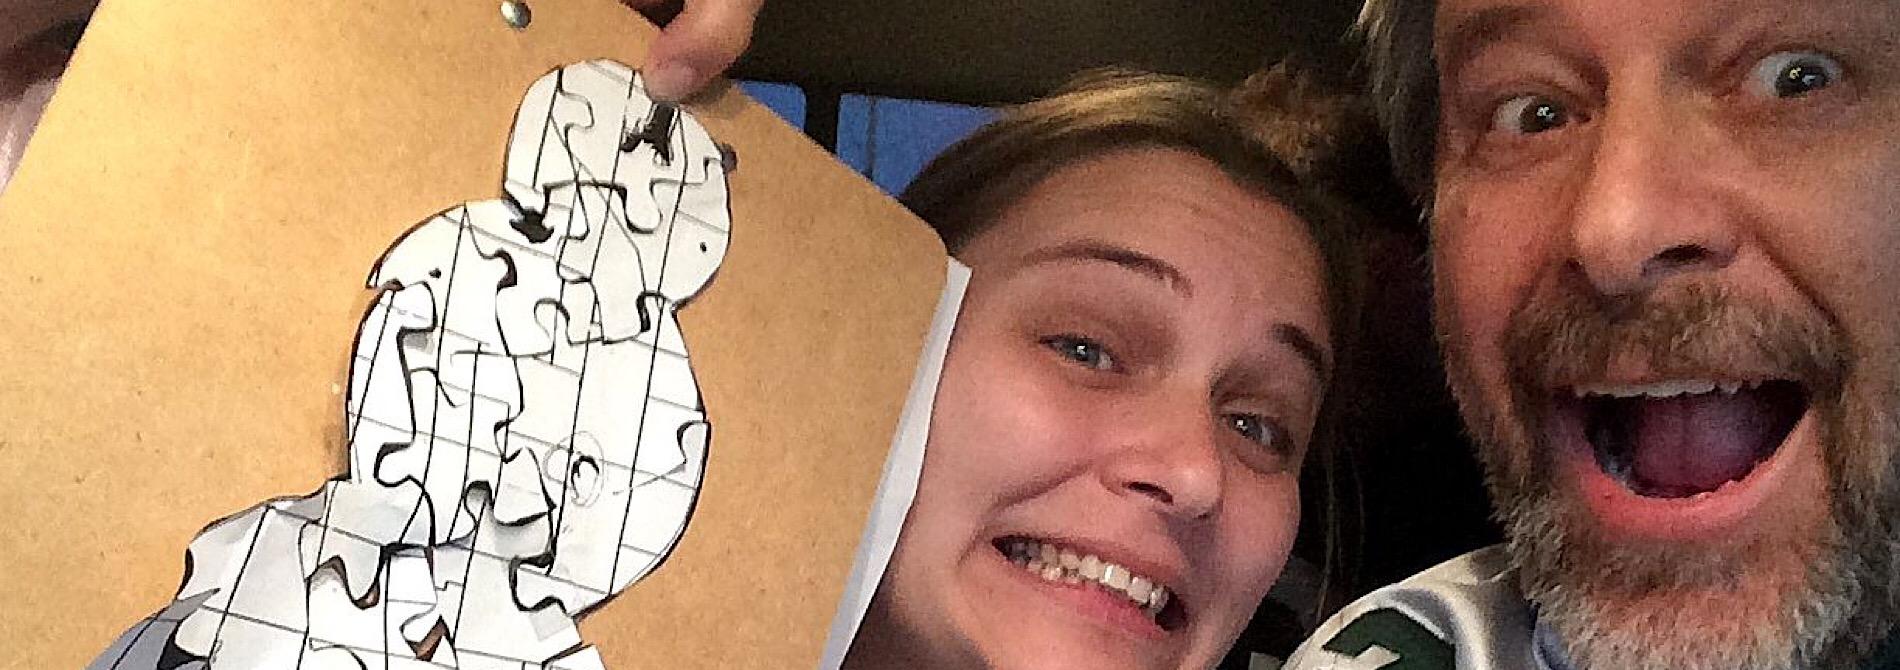 puzzle solvers create snowman crossword